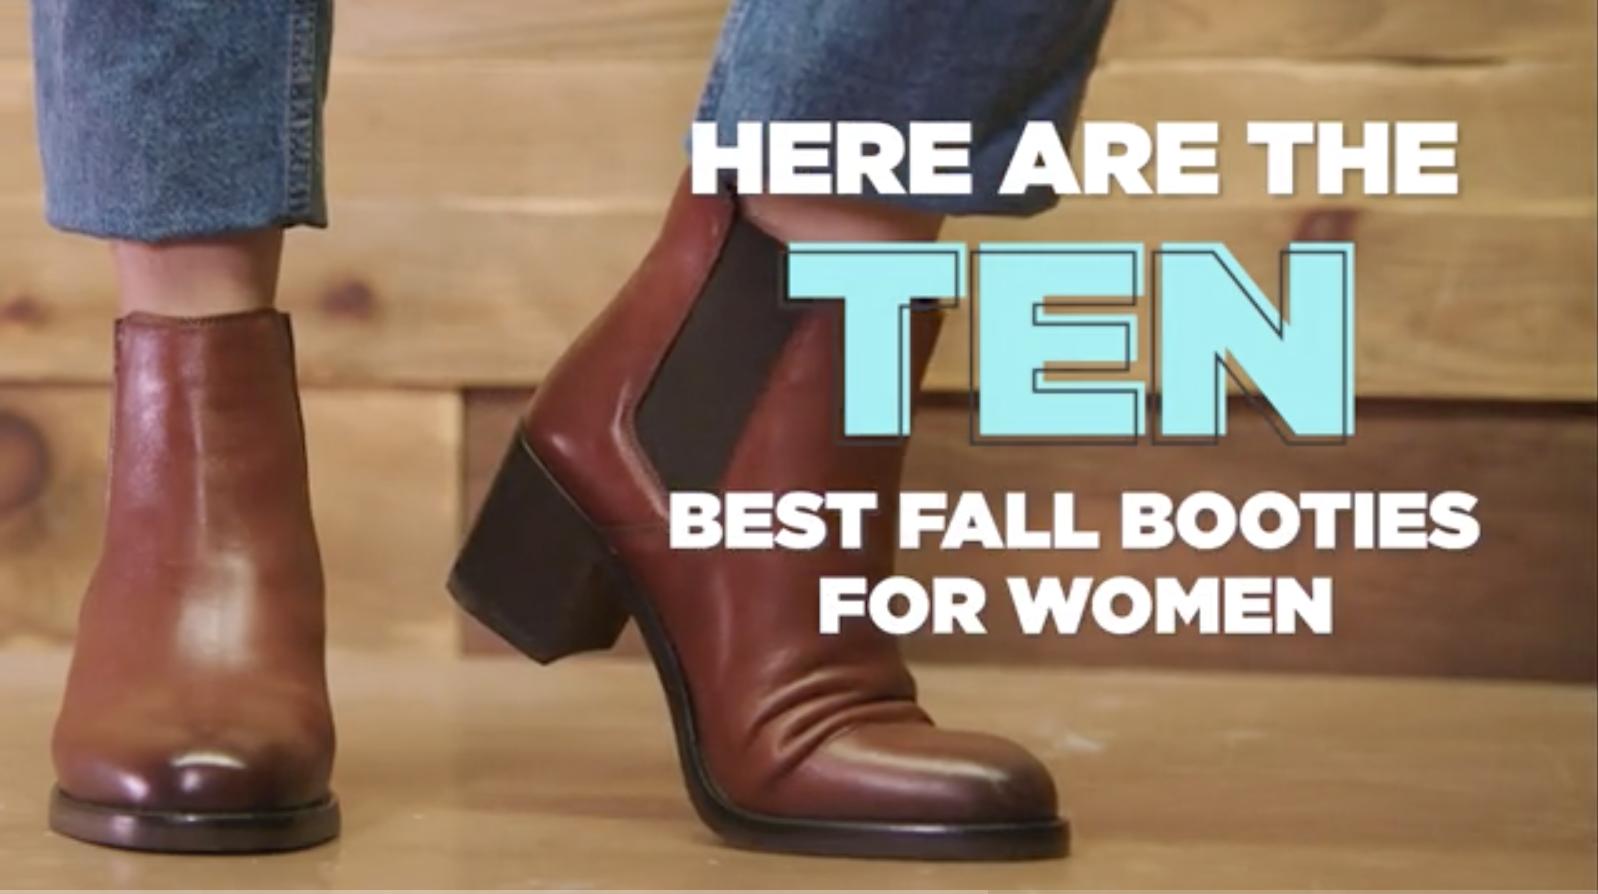 10 best fall booties for women 2019